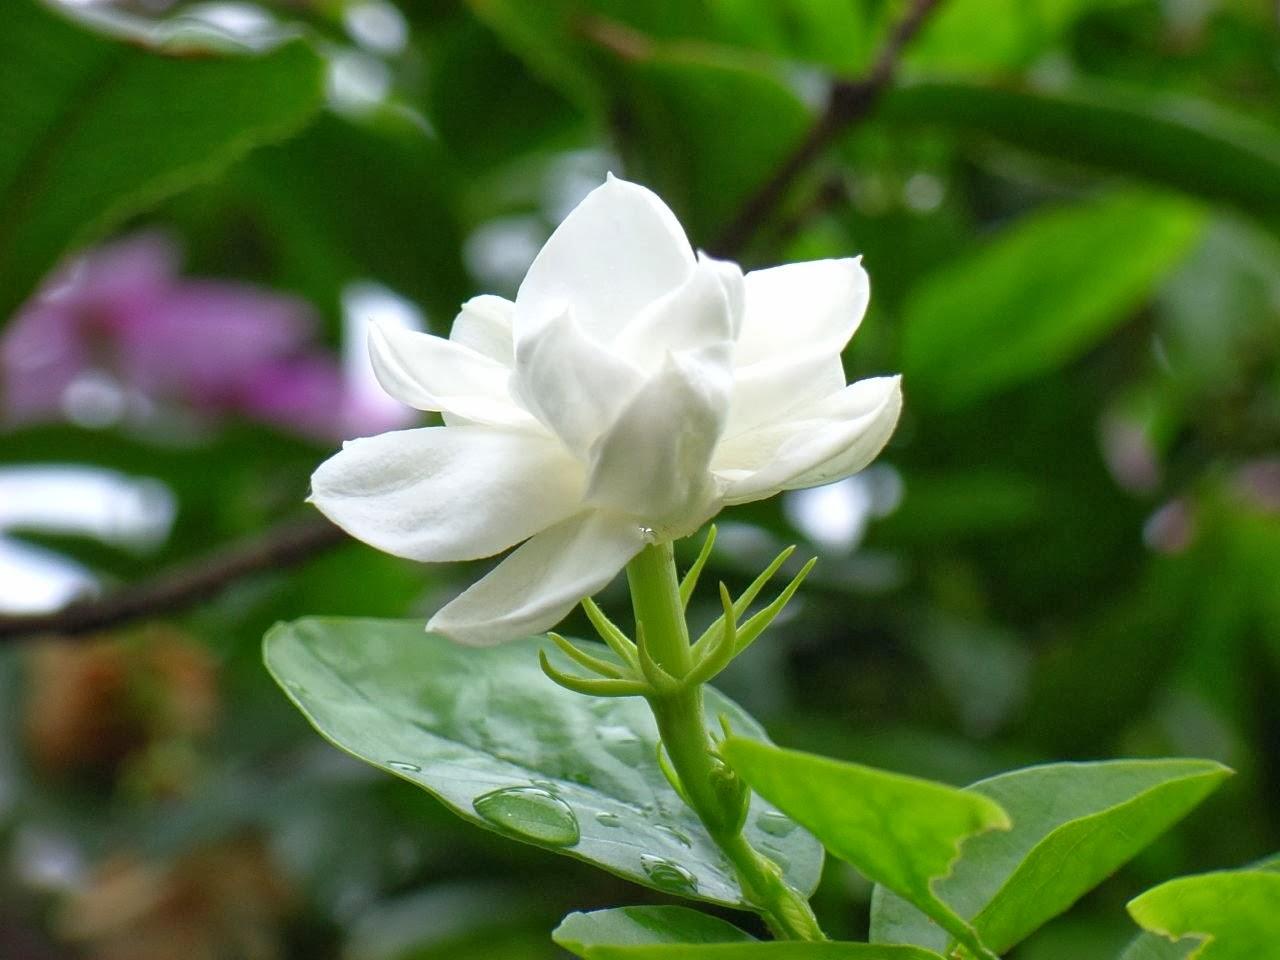 Very nice jasmine flowers wallpapers izmirmasajfo